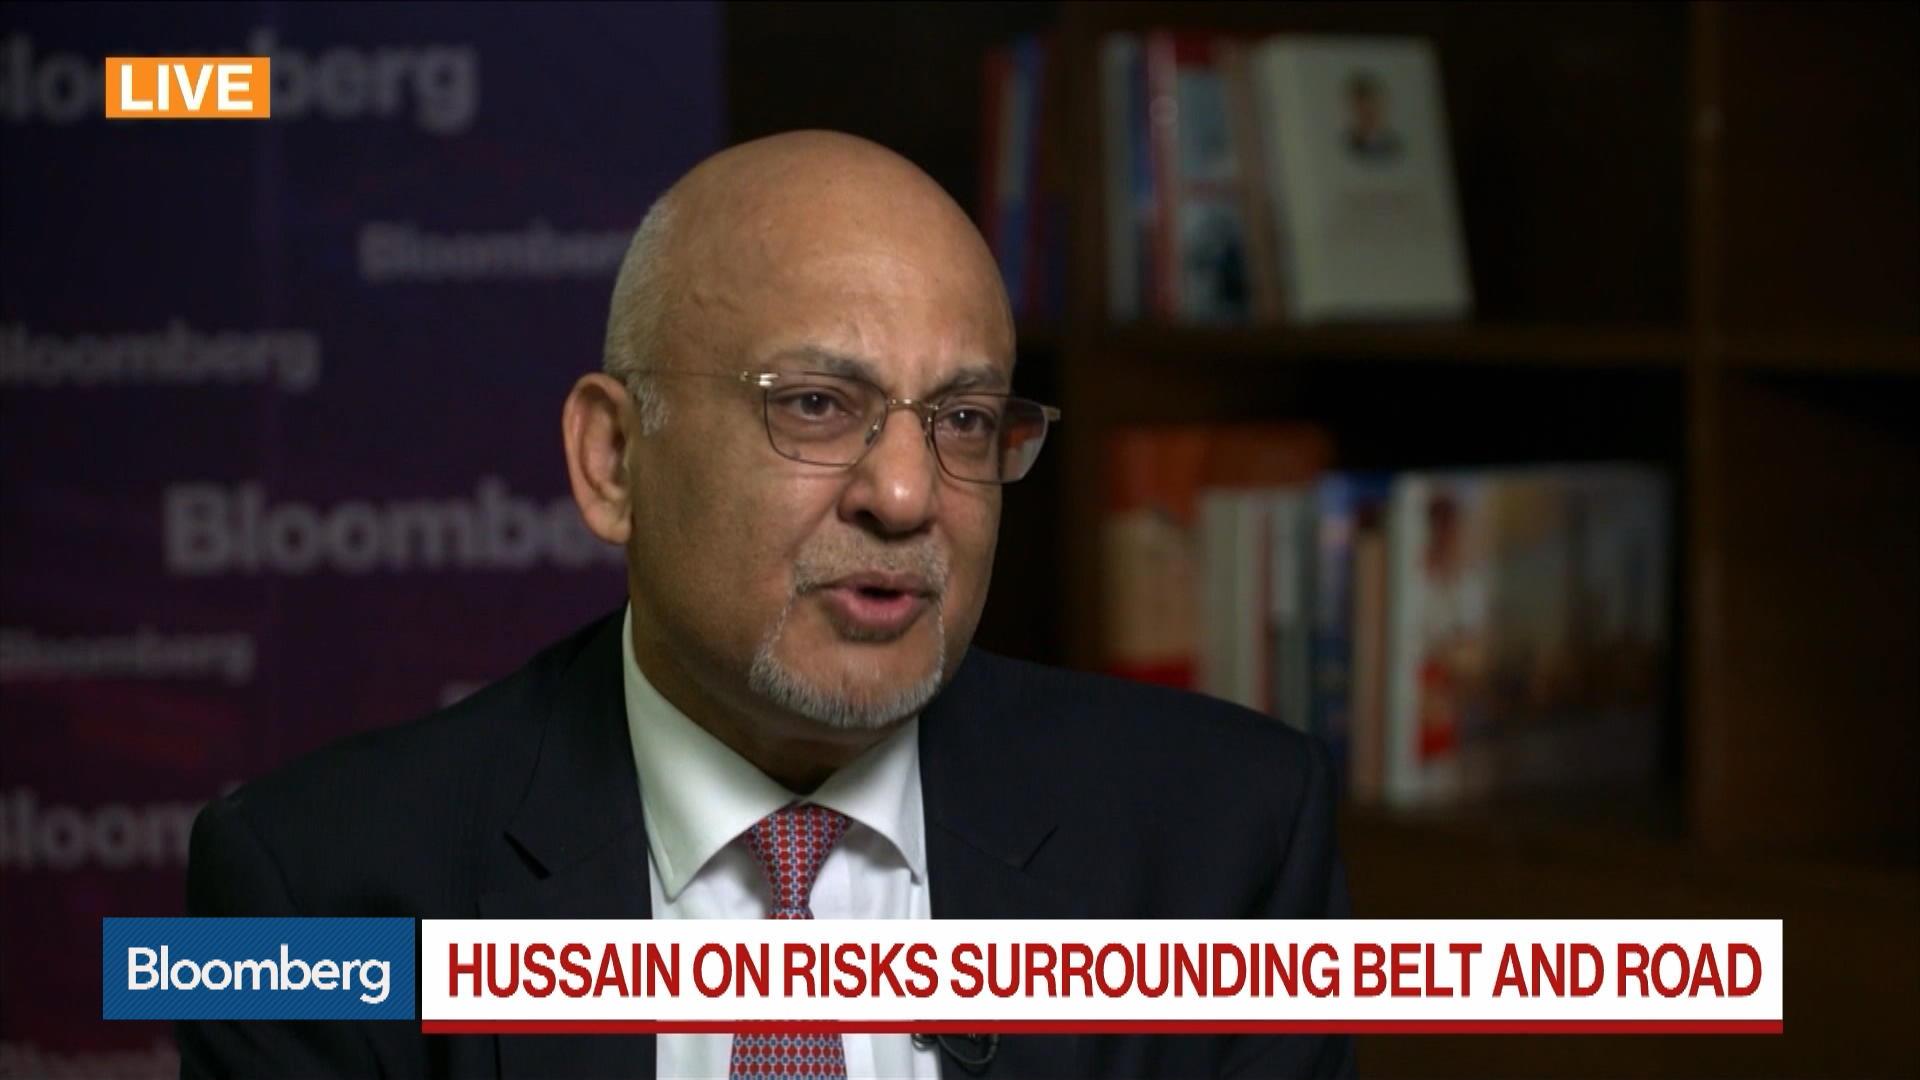 HSBC's Hussain on China's Belt & Road Initiative, Project Risks, HSBC Benefit